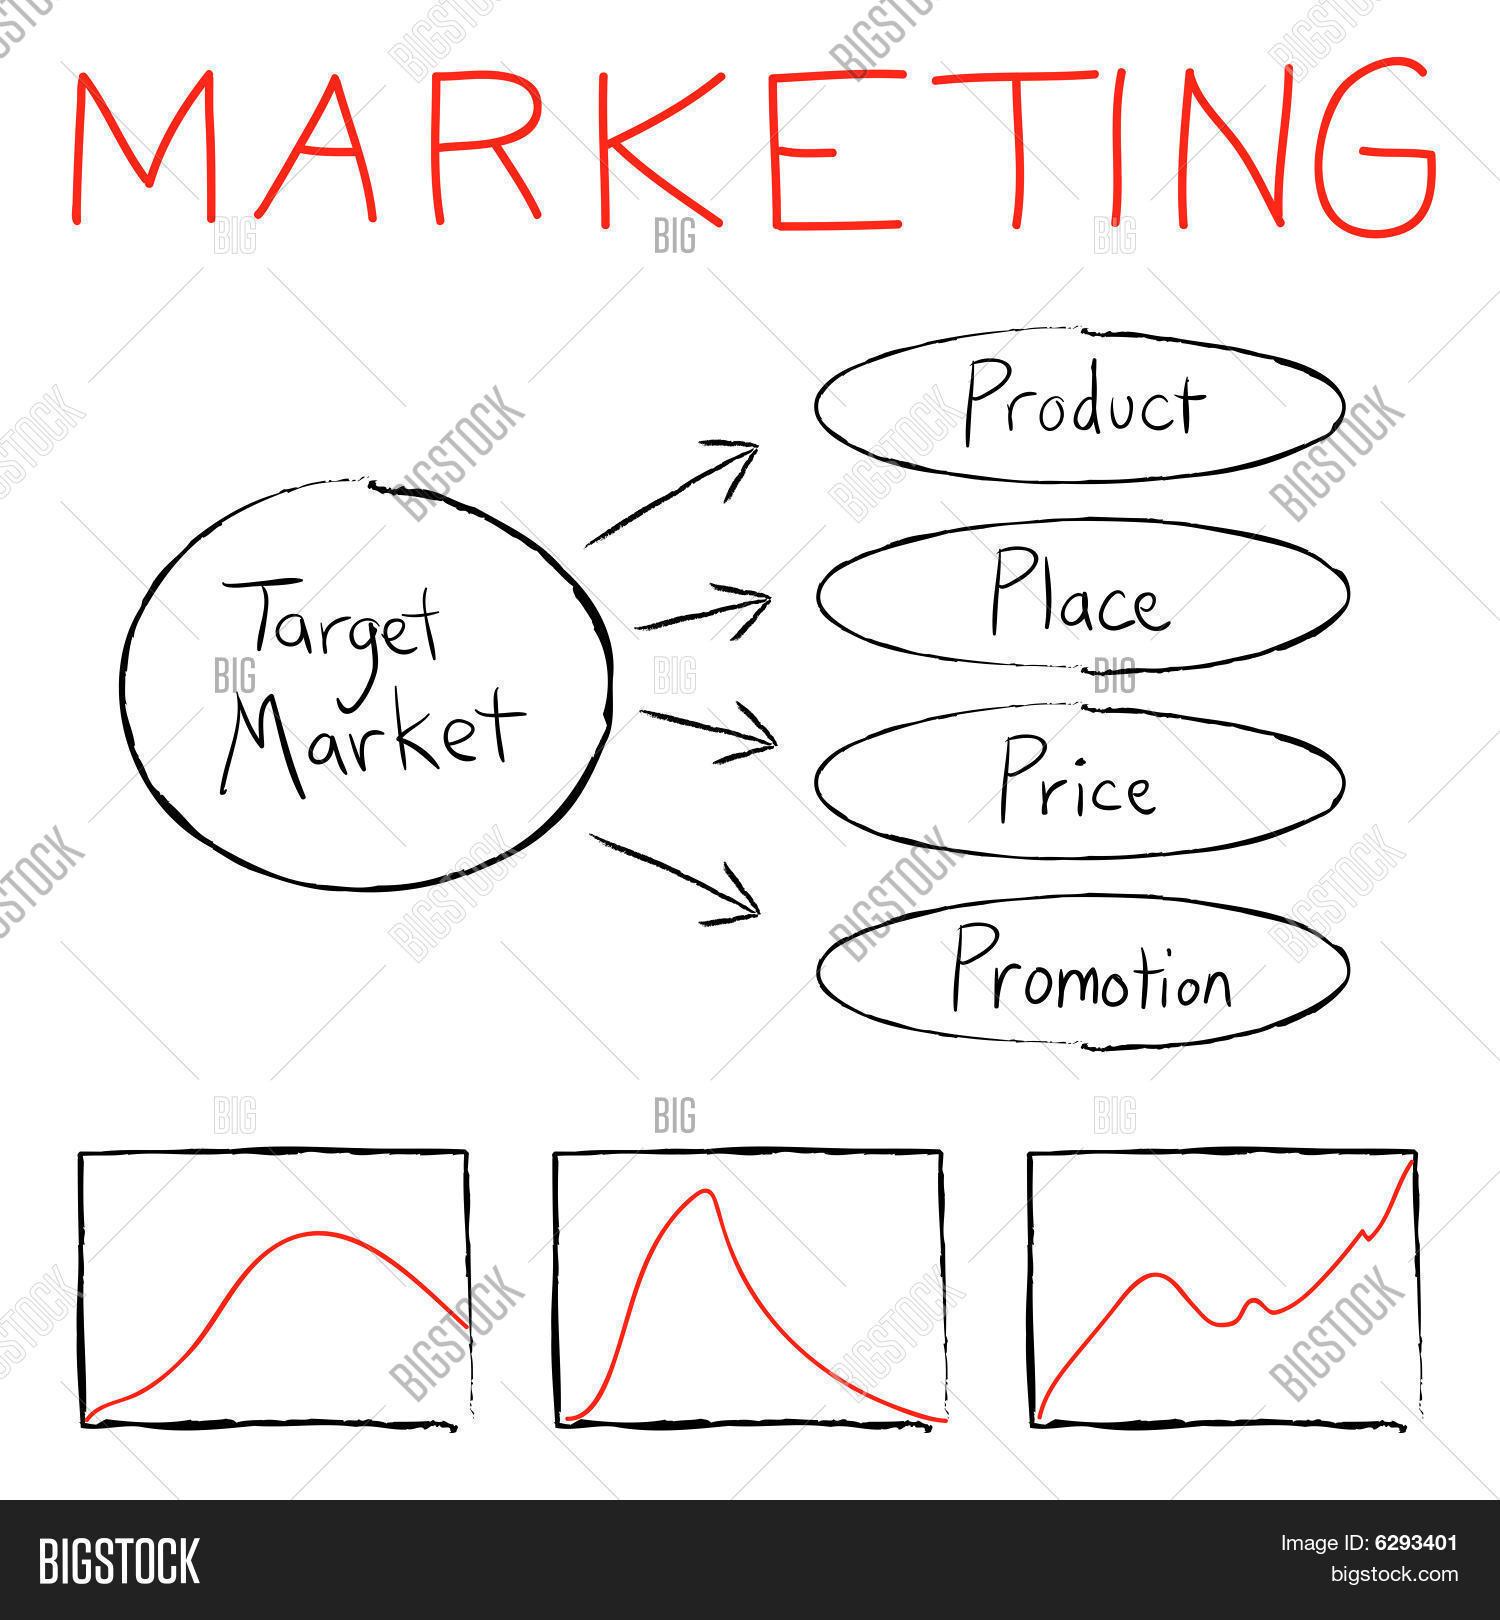 Marketing Diagram Vector Amp Photo Free Trial